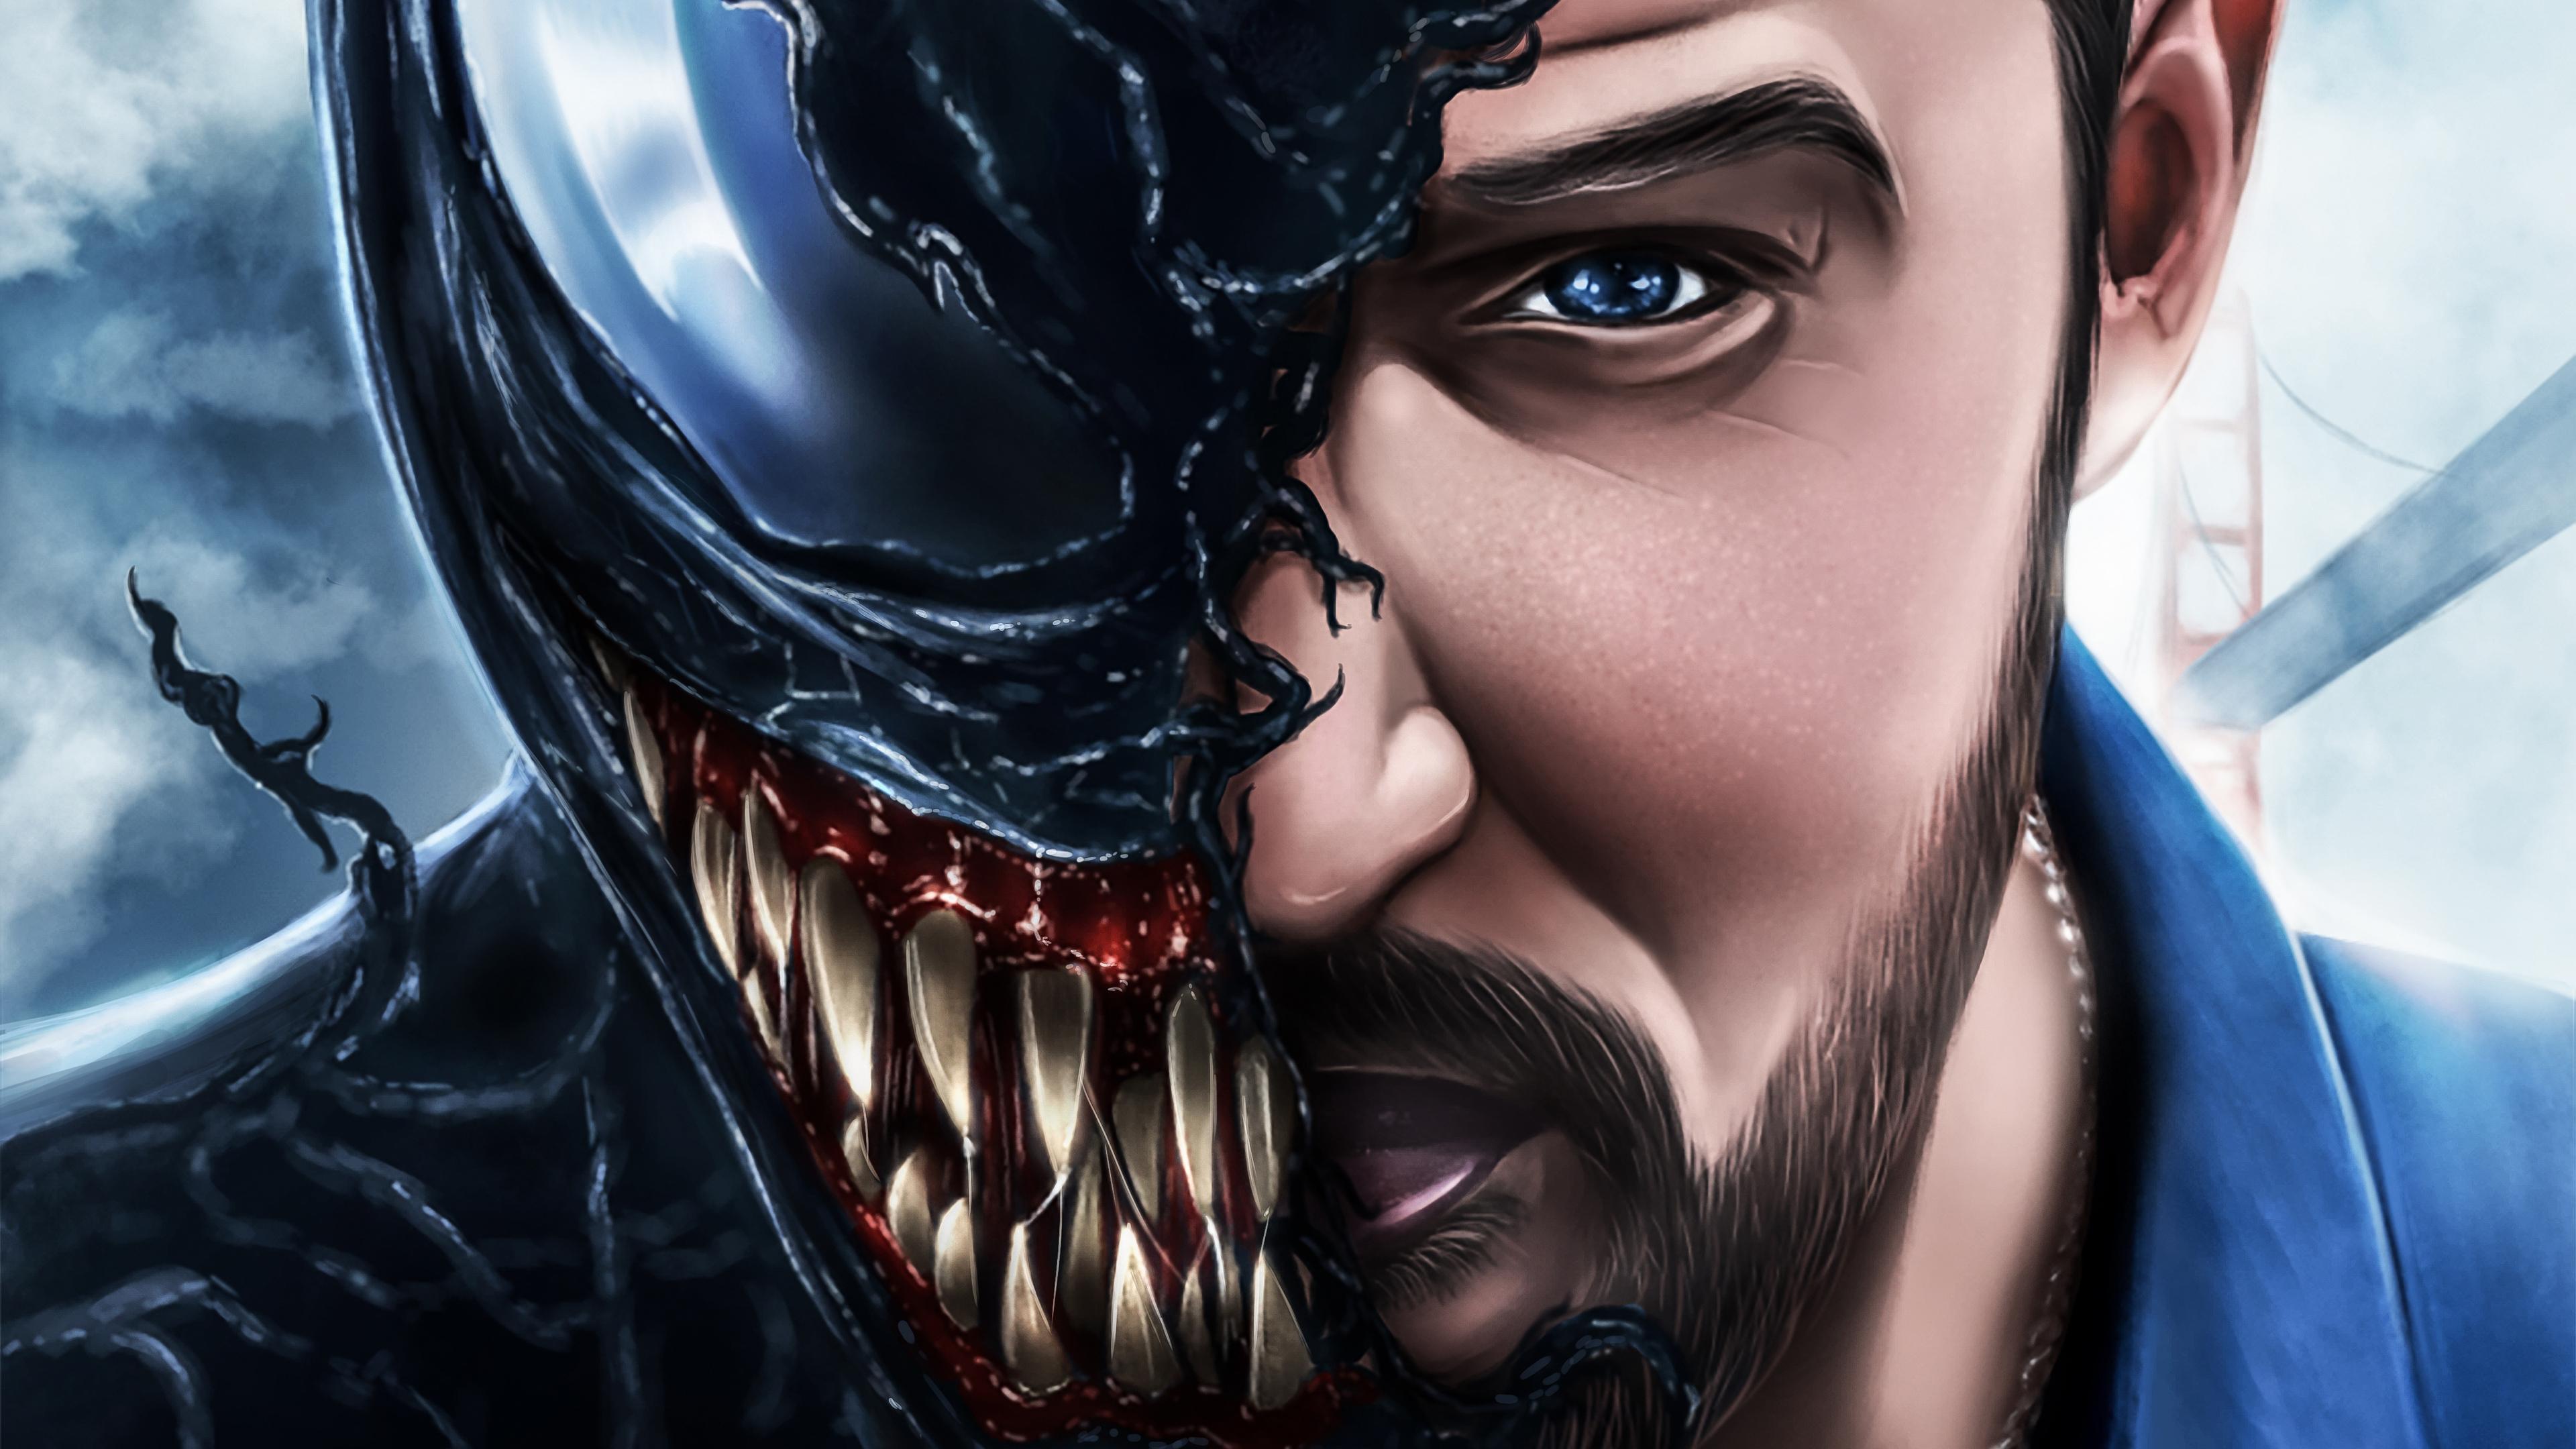 venom movie artwork 4k 2018 1538786564 - Venom Movie Artwork 4k 2018 - Venom wallpapers, venom movie wallpapers, superheroes wallpapers, hd-wallpapers, digital art wallpapers, deviantart wallpapers, artwork wallpapers, 4k-wallpapers